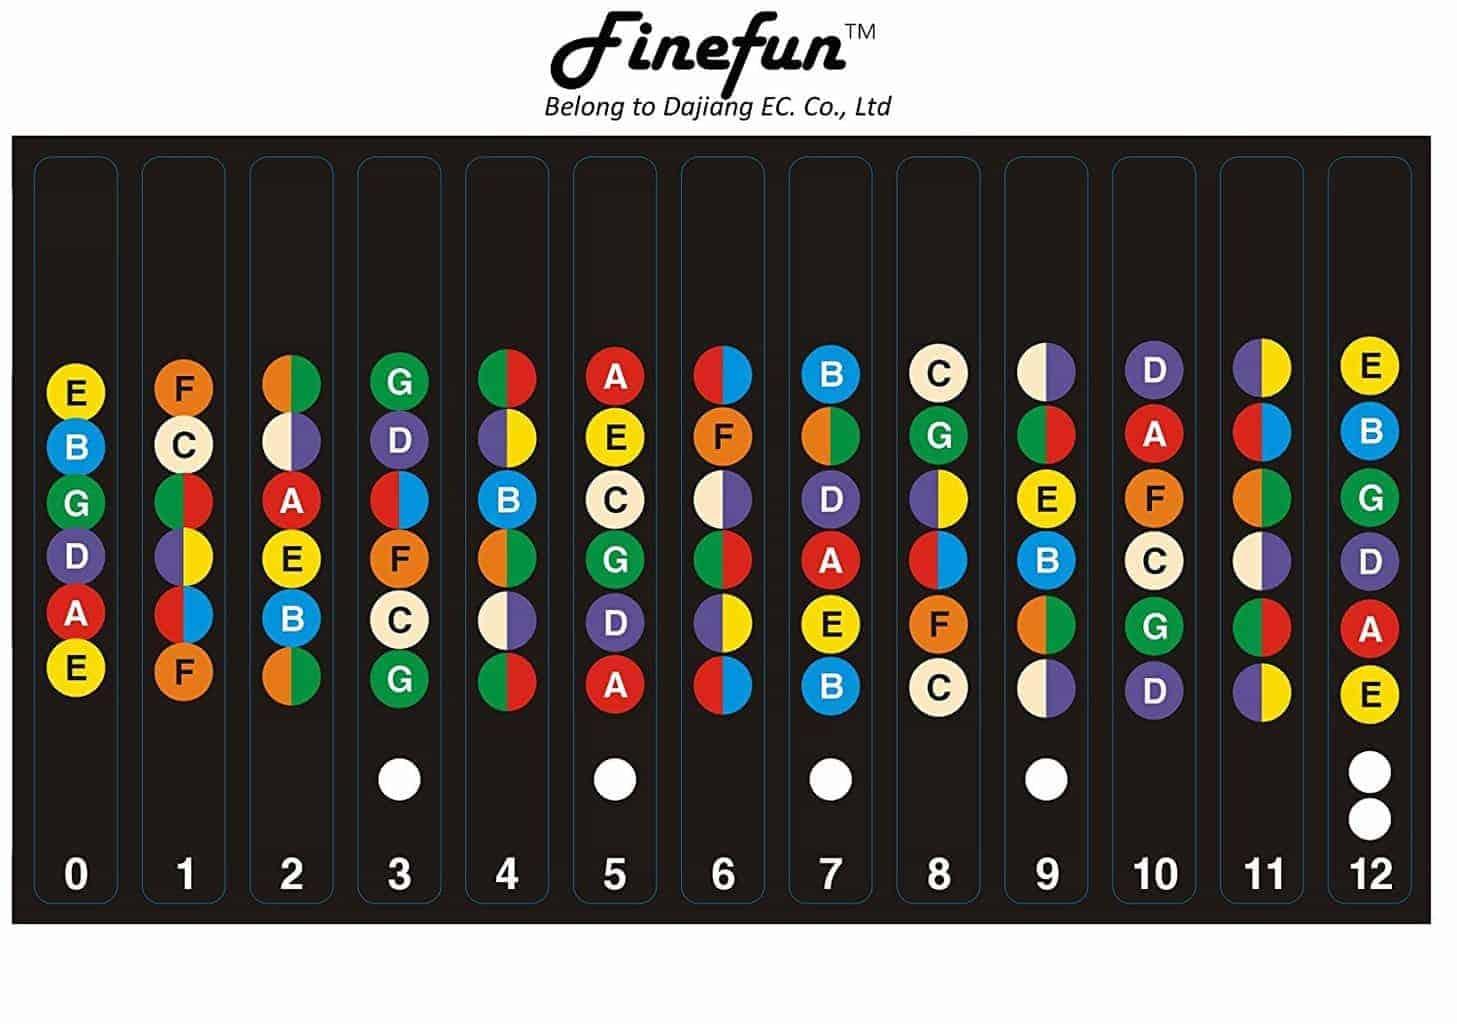 Finefun Guitar Fretboard Note Decals For Beginners Zaid Crowe